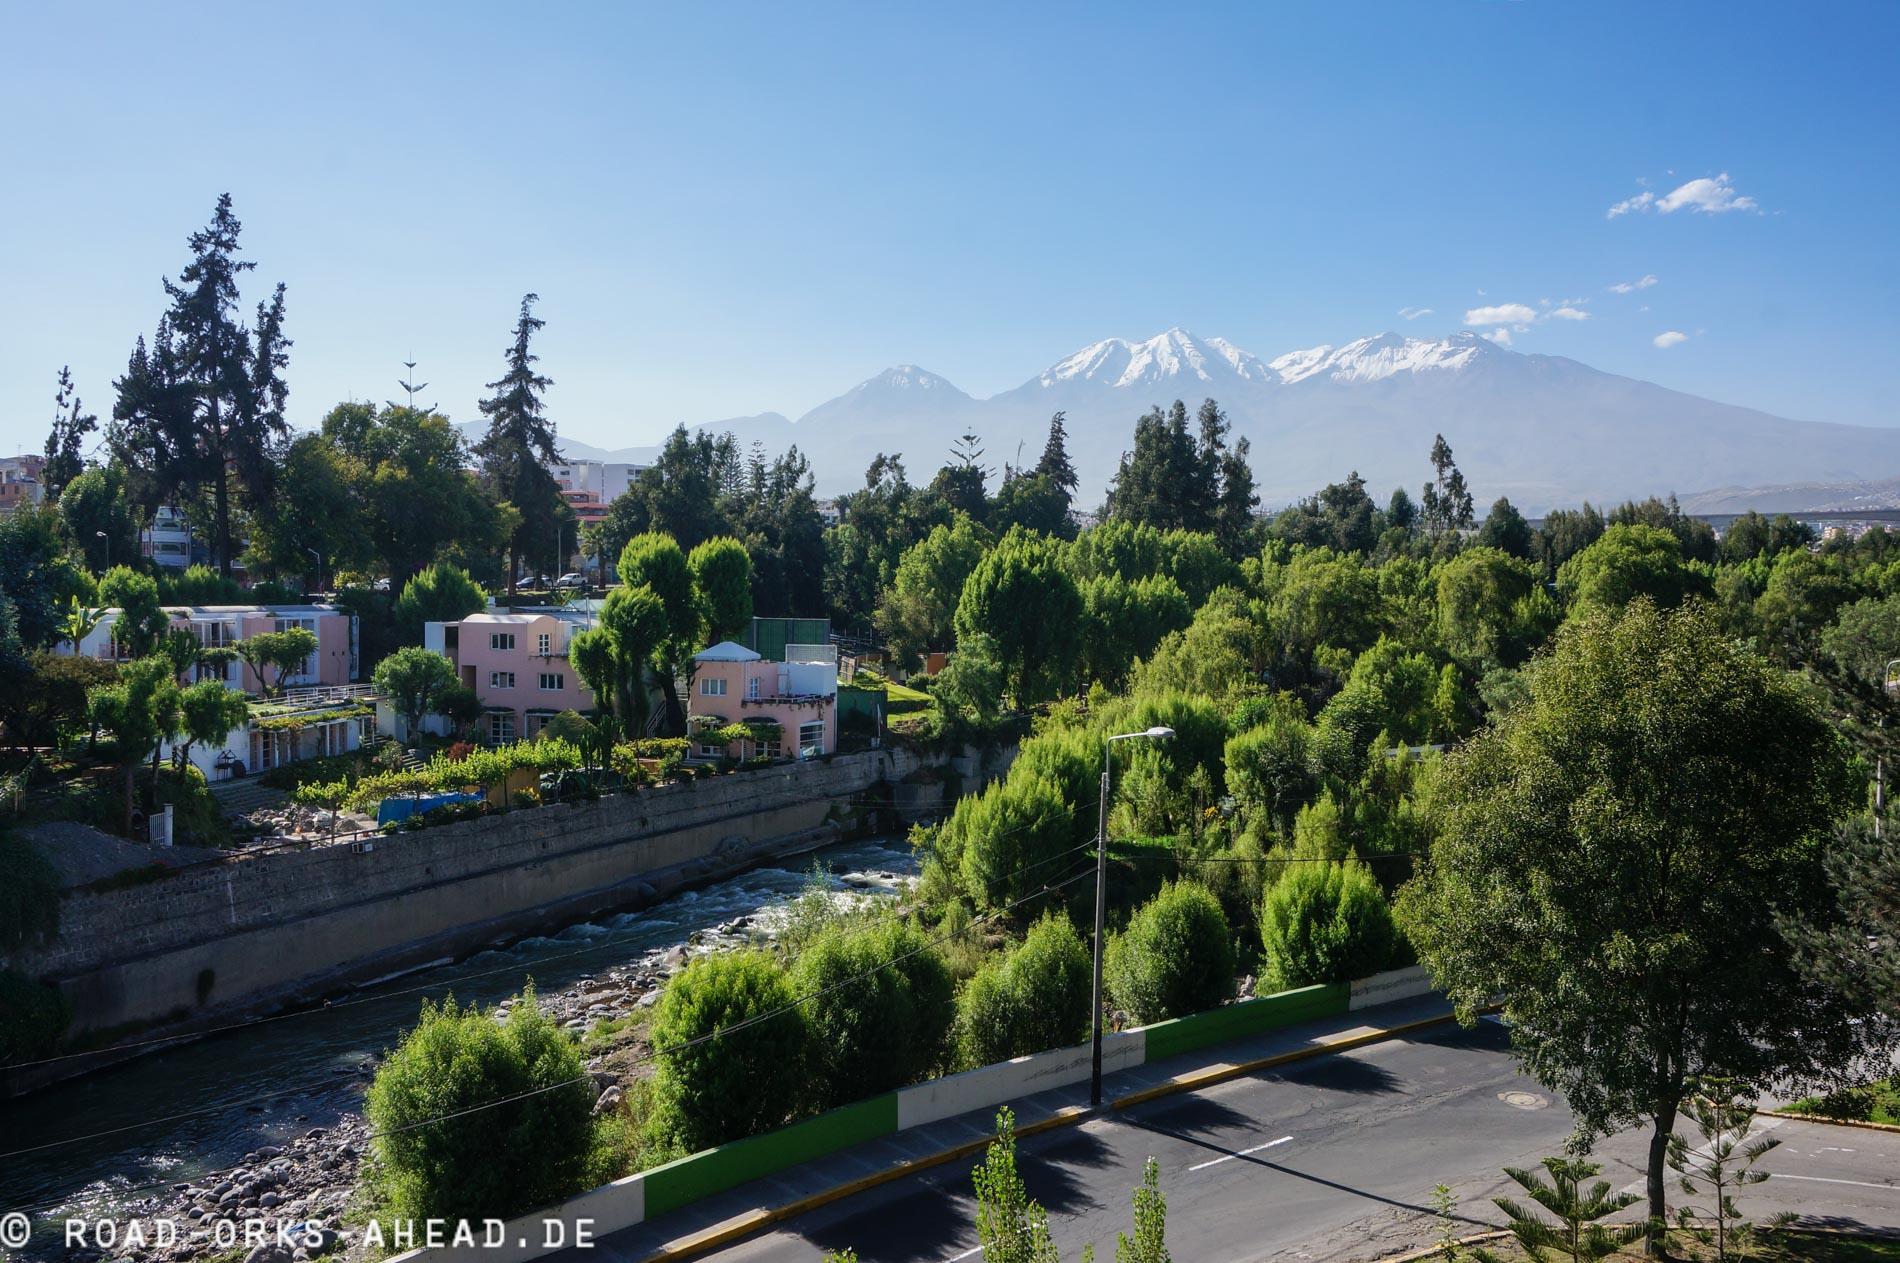 Arequipa, Blick auf die umgebenen Vulkane